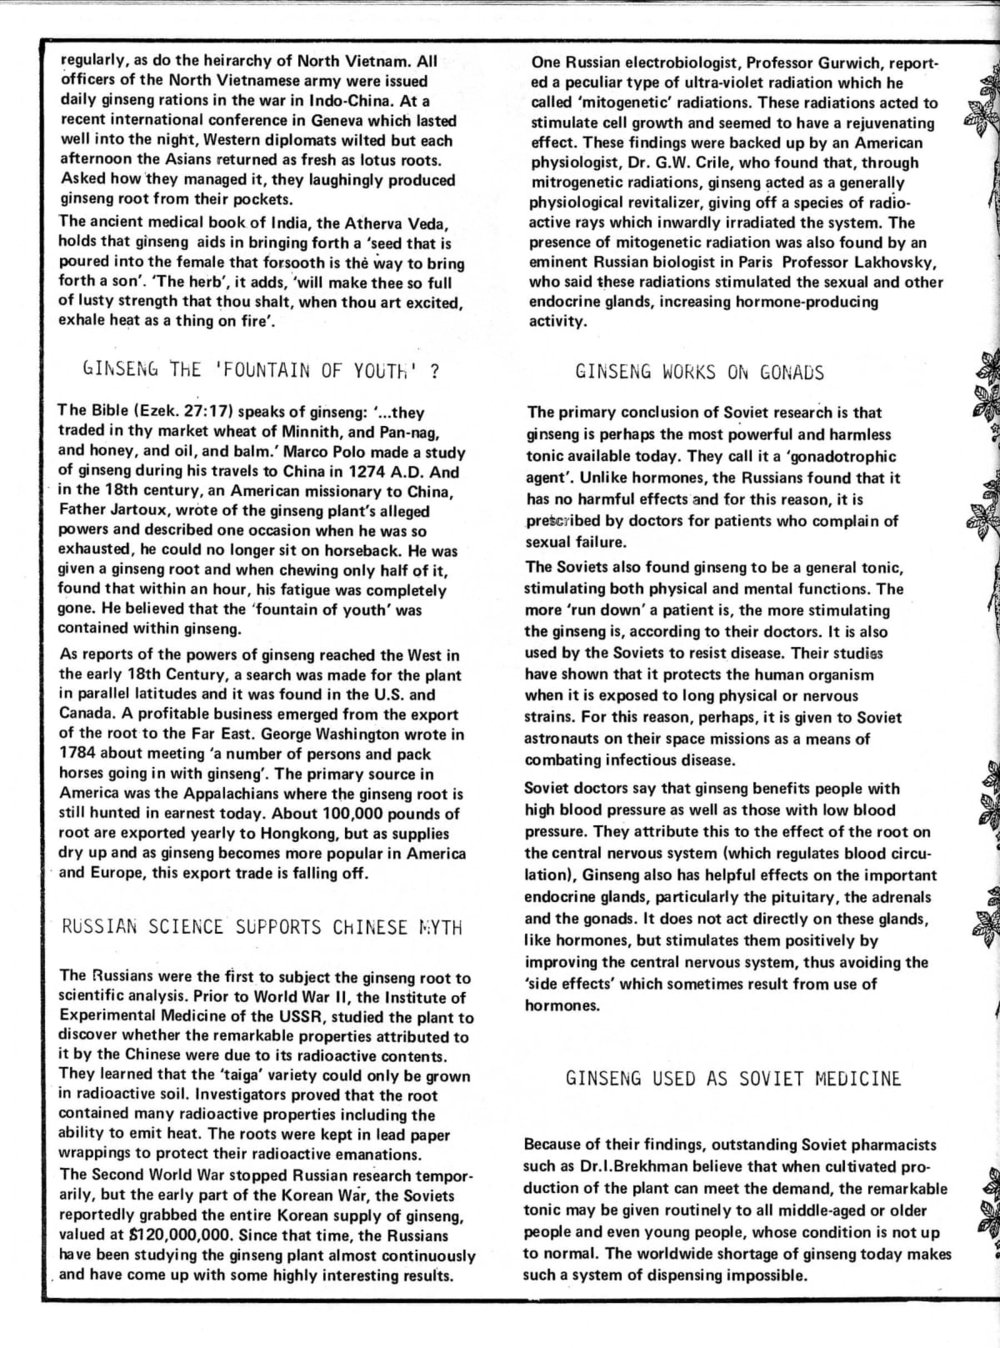 seed-v2-n4-april1973-16.jpg